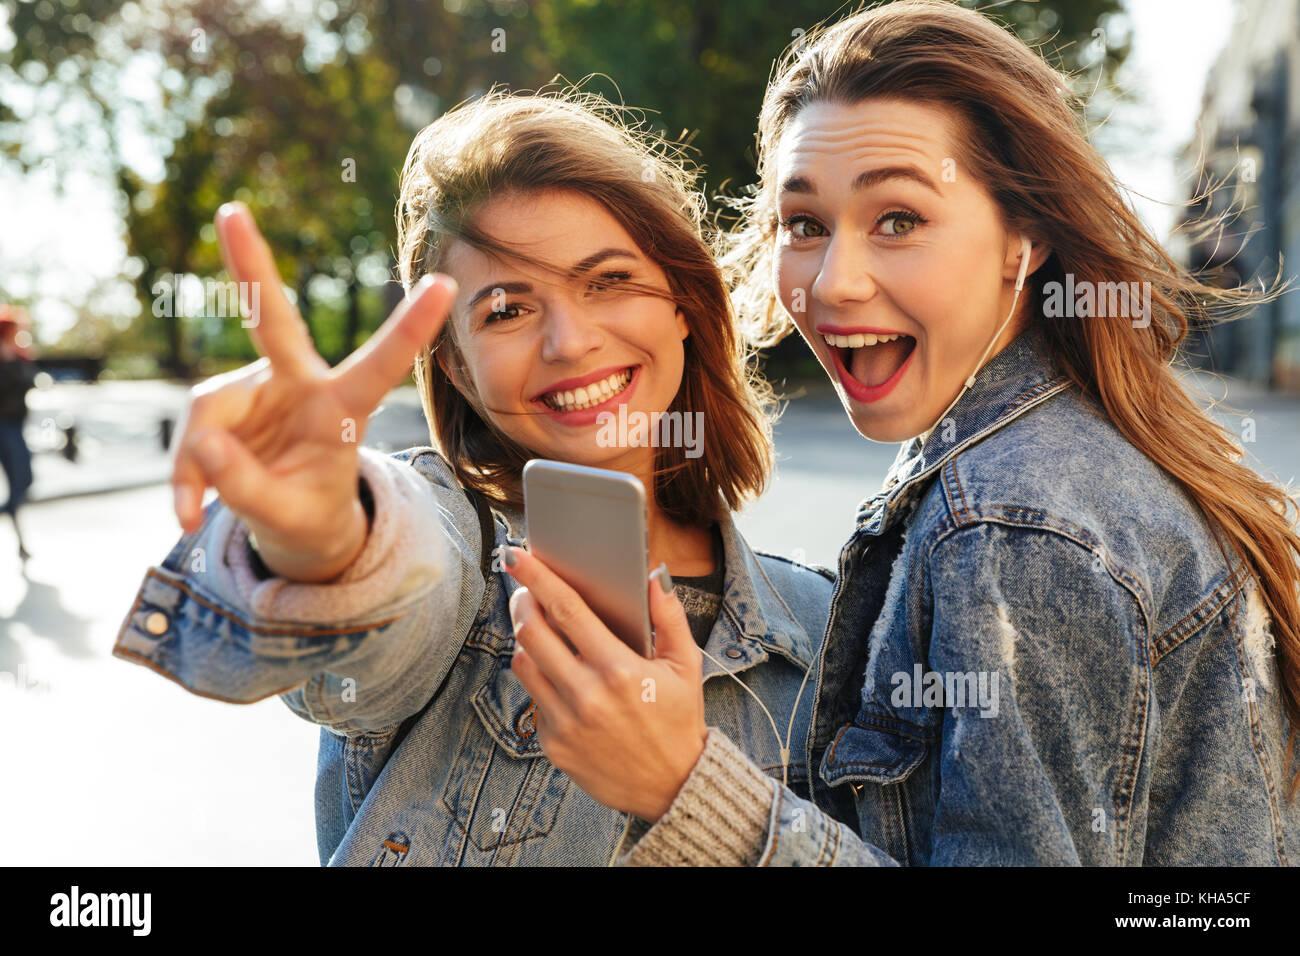 Outdoor teen thumbs